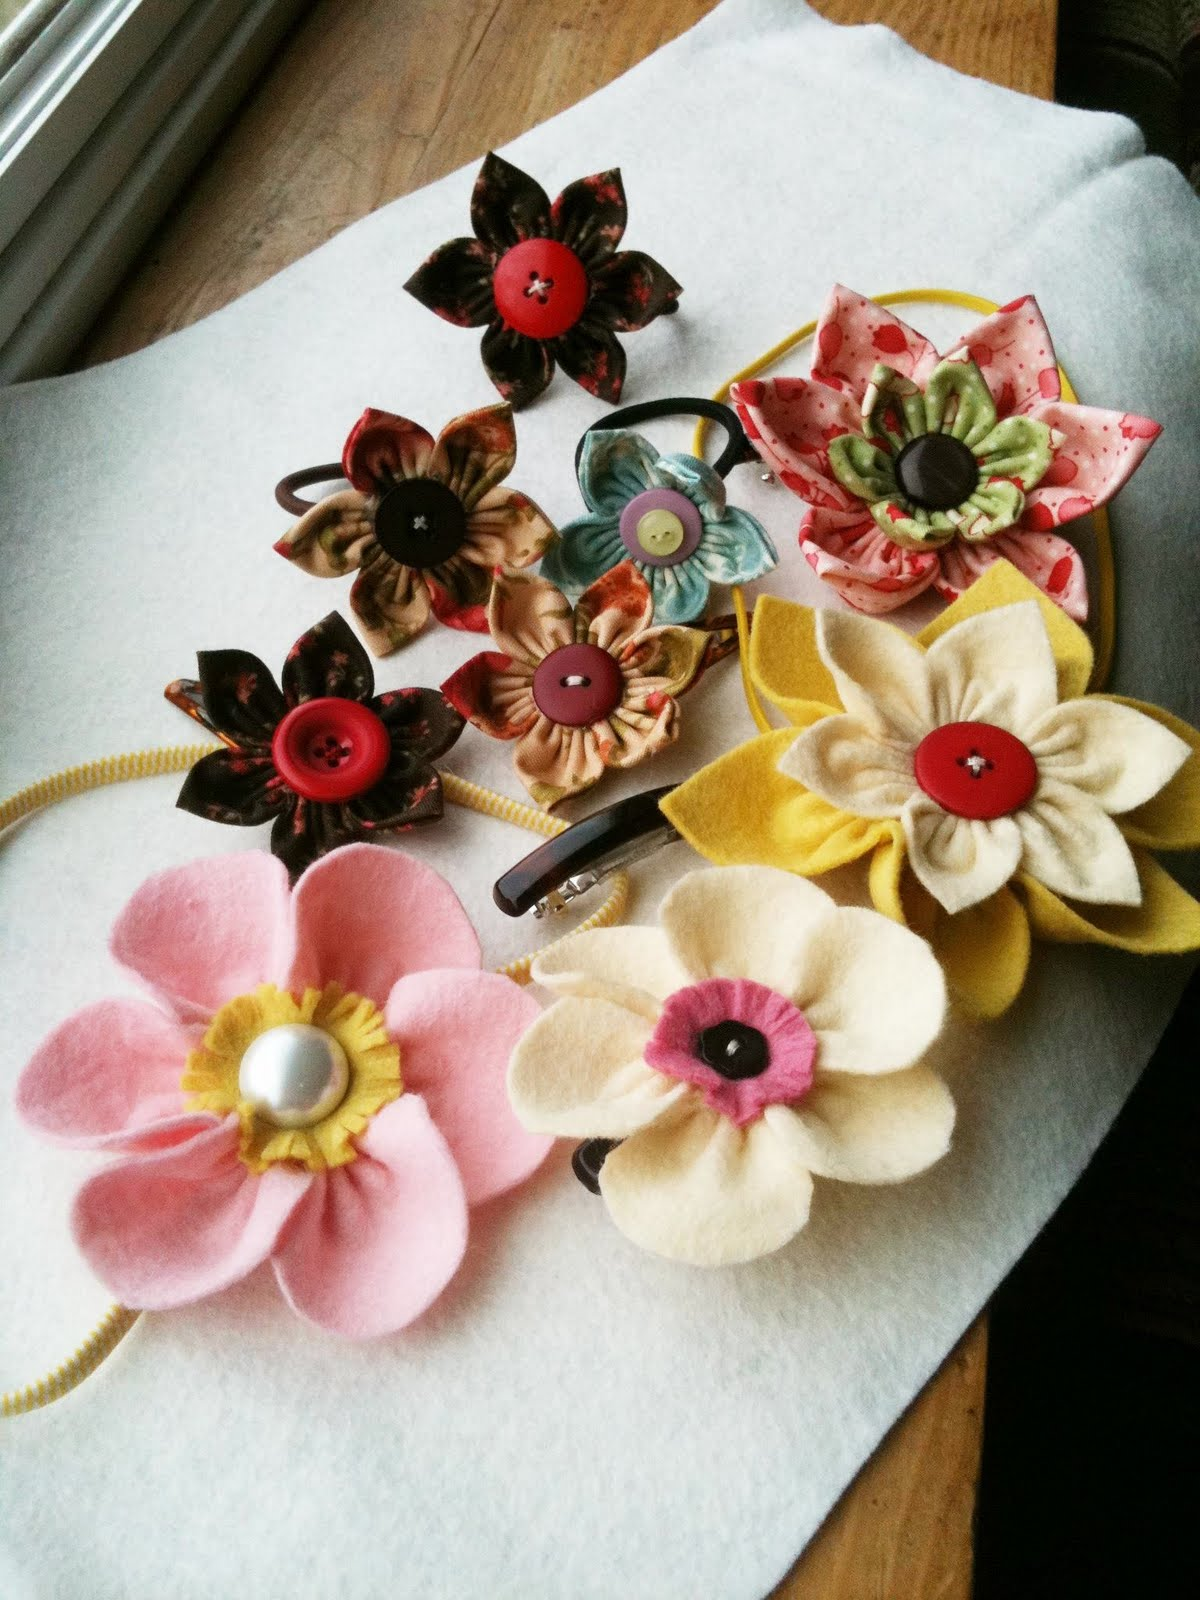 Sewing Felt Flowers